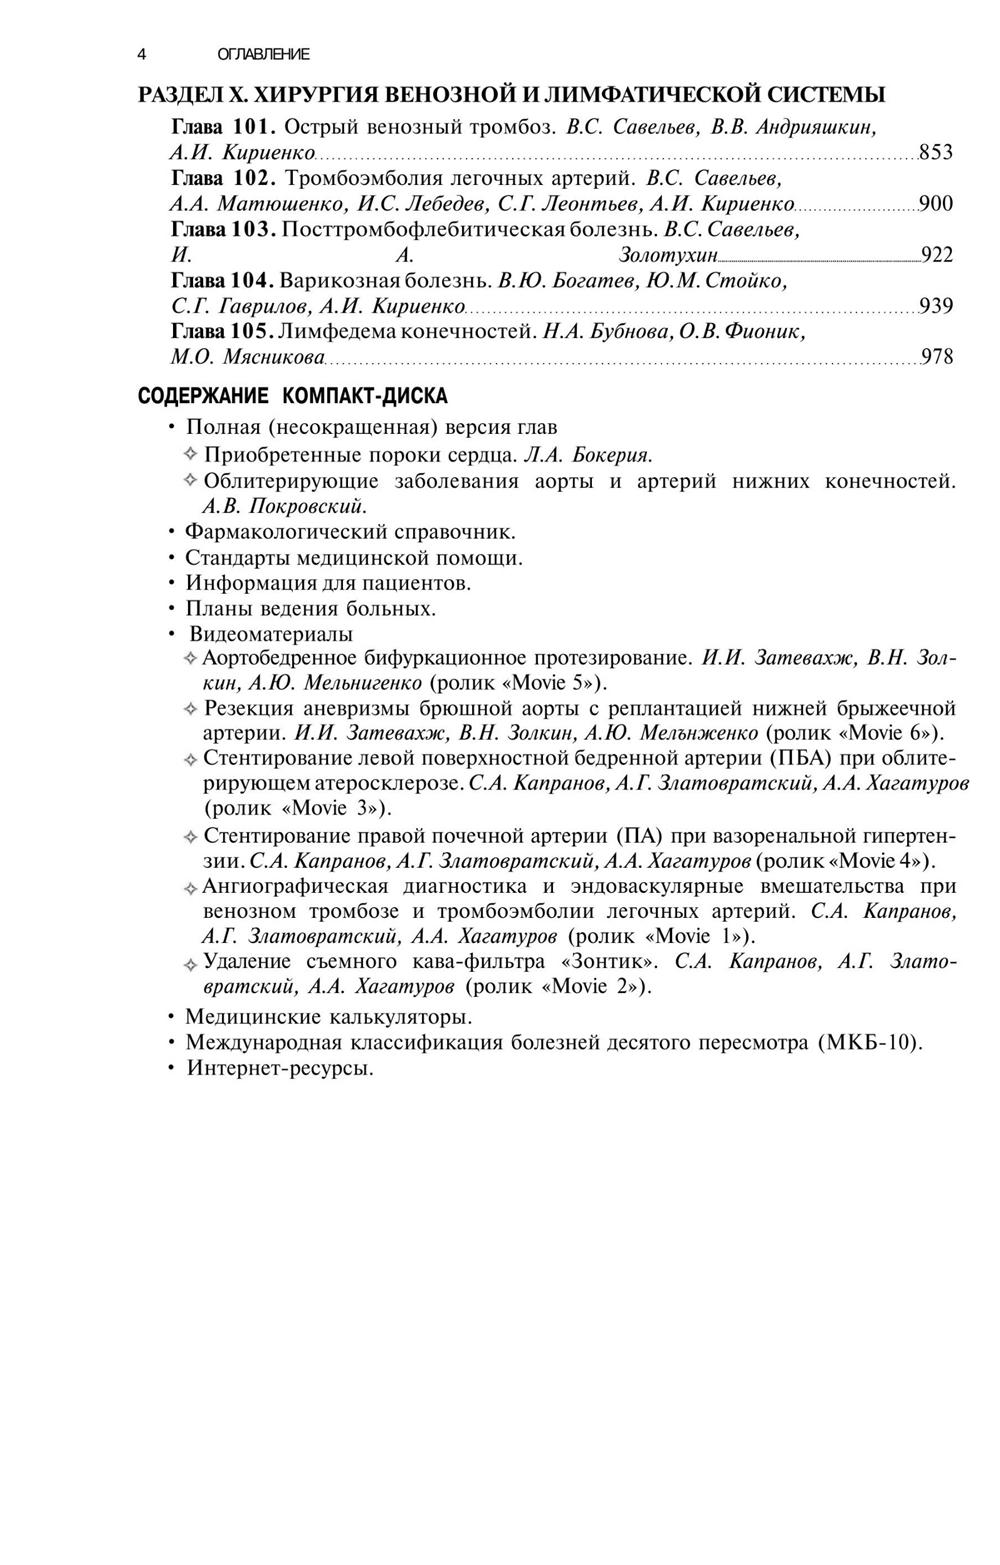 http://ipic.su/img/img7/fs/02.1591284339.jpg